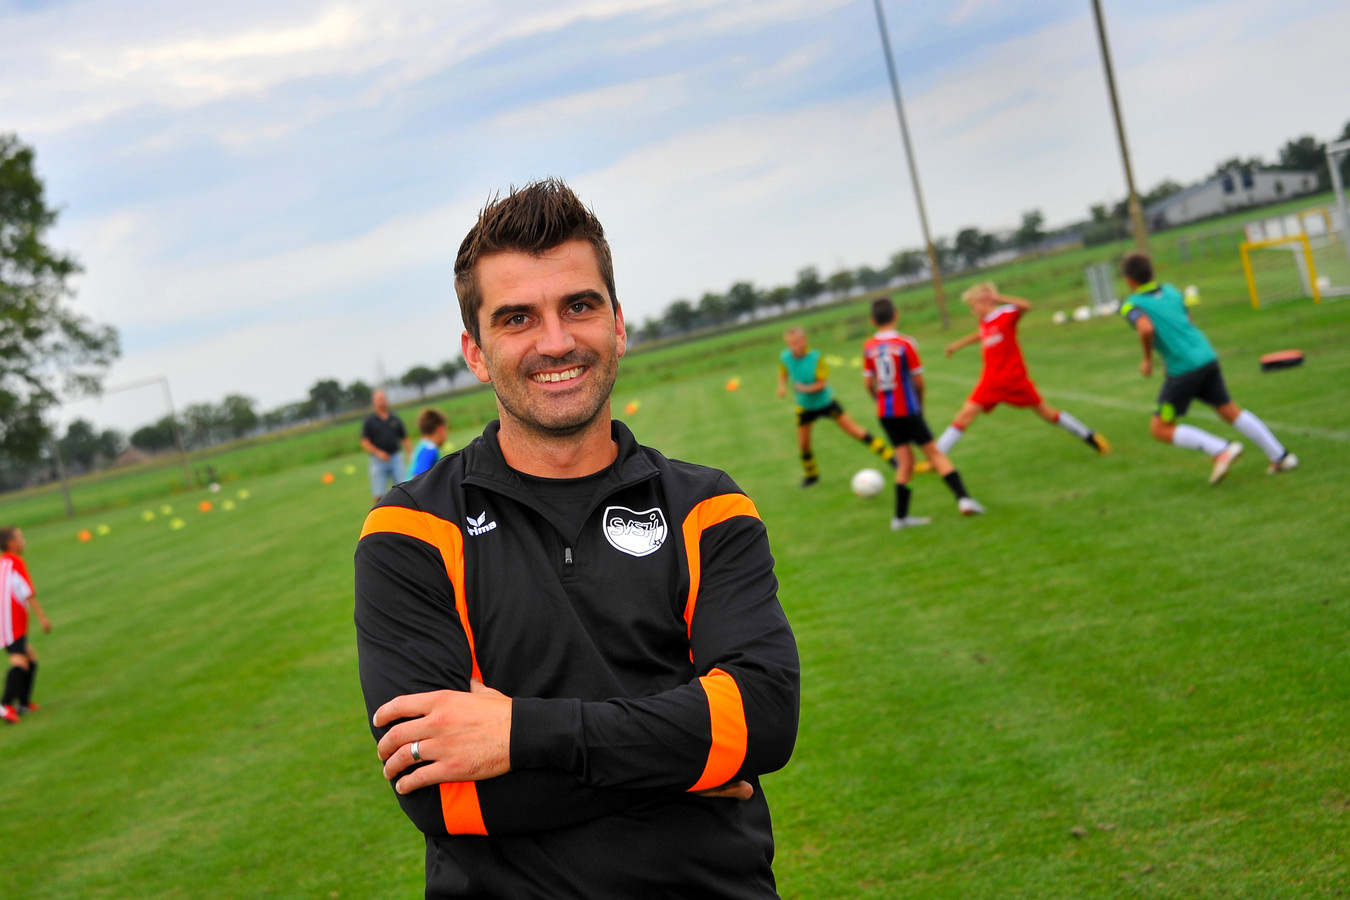 Niels Roijakkers trainer SVSH Someren Heide